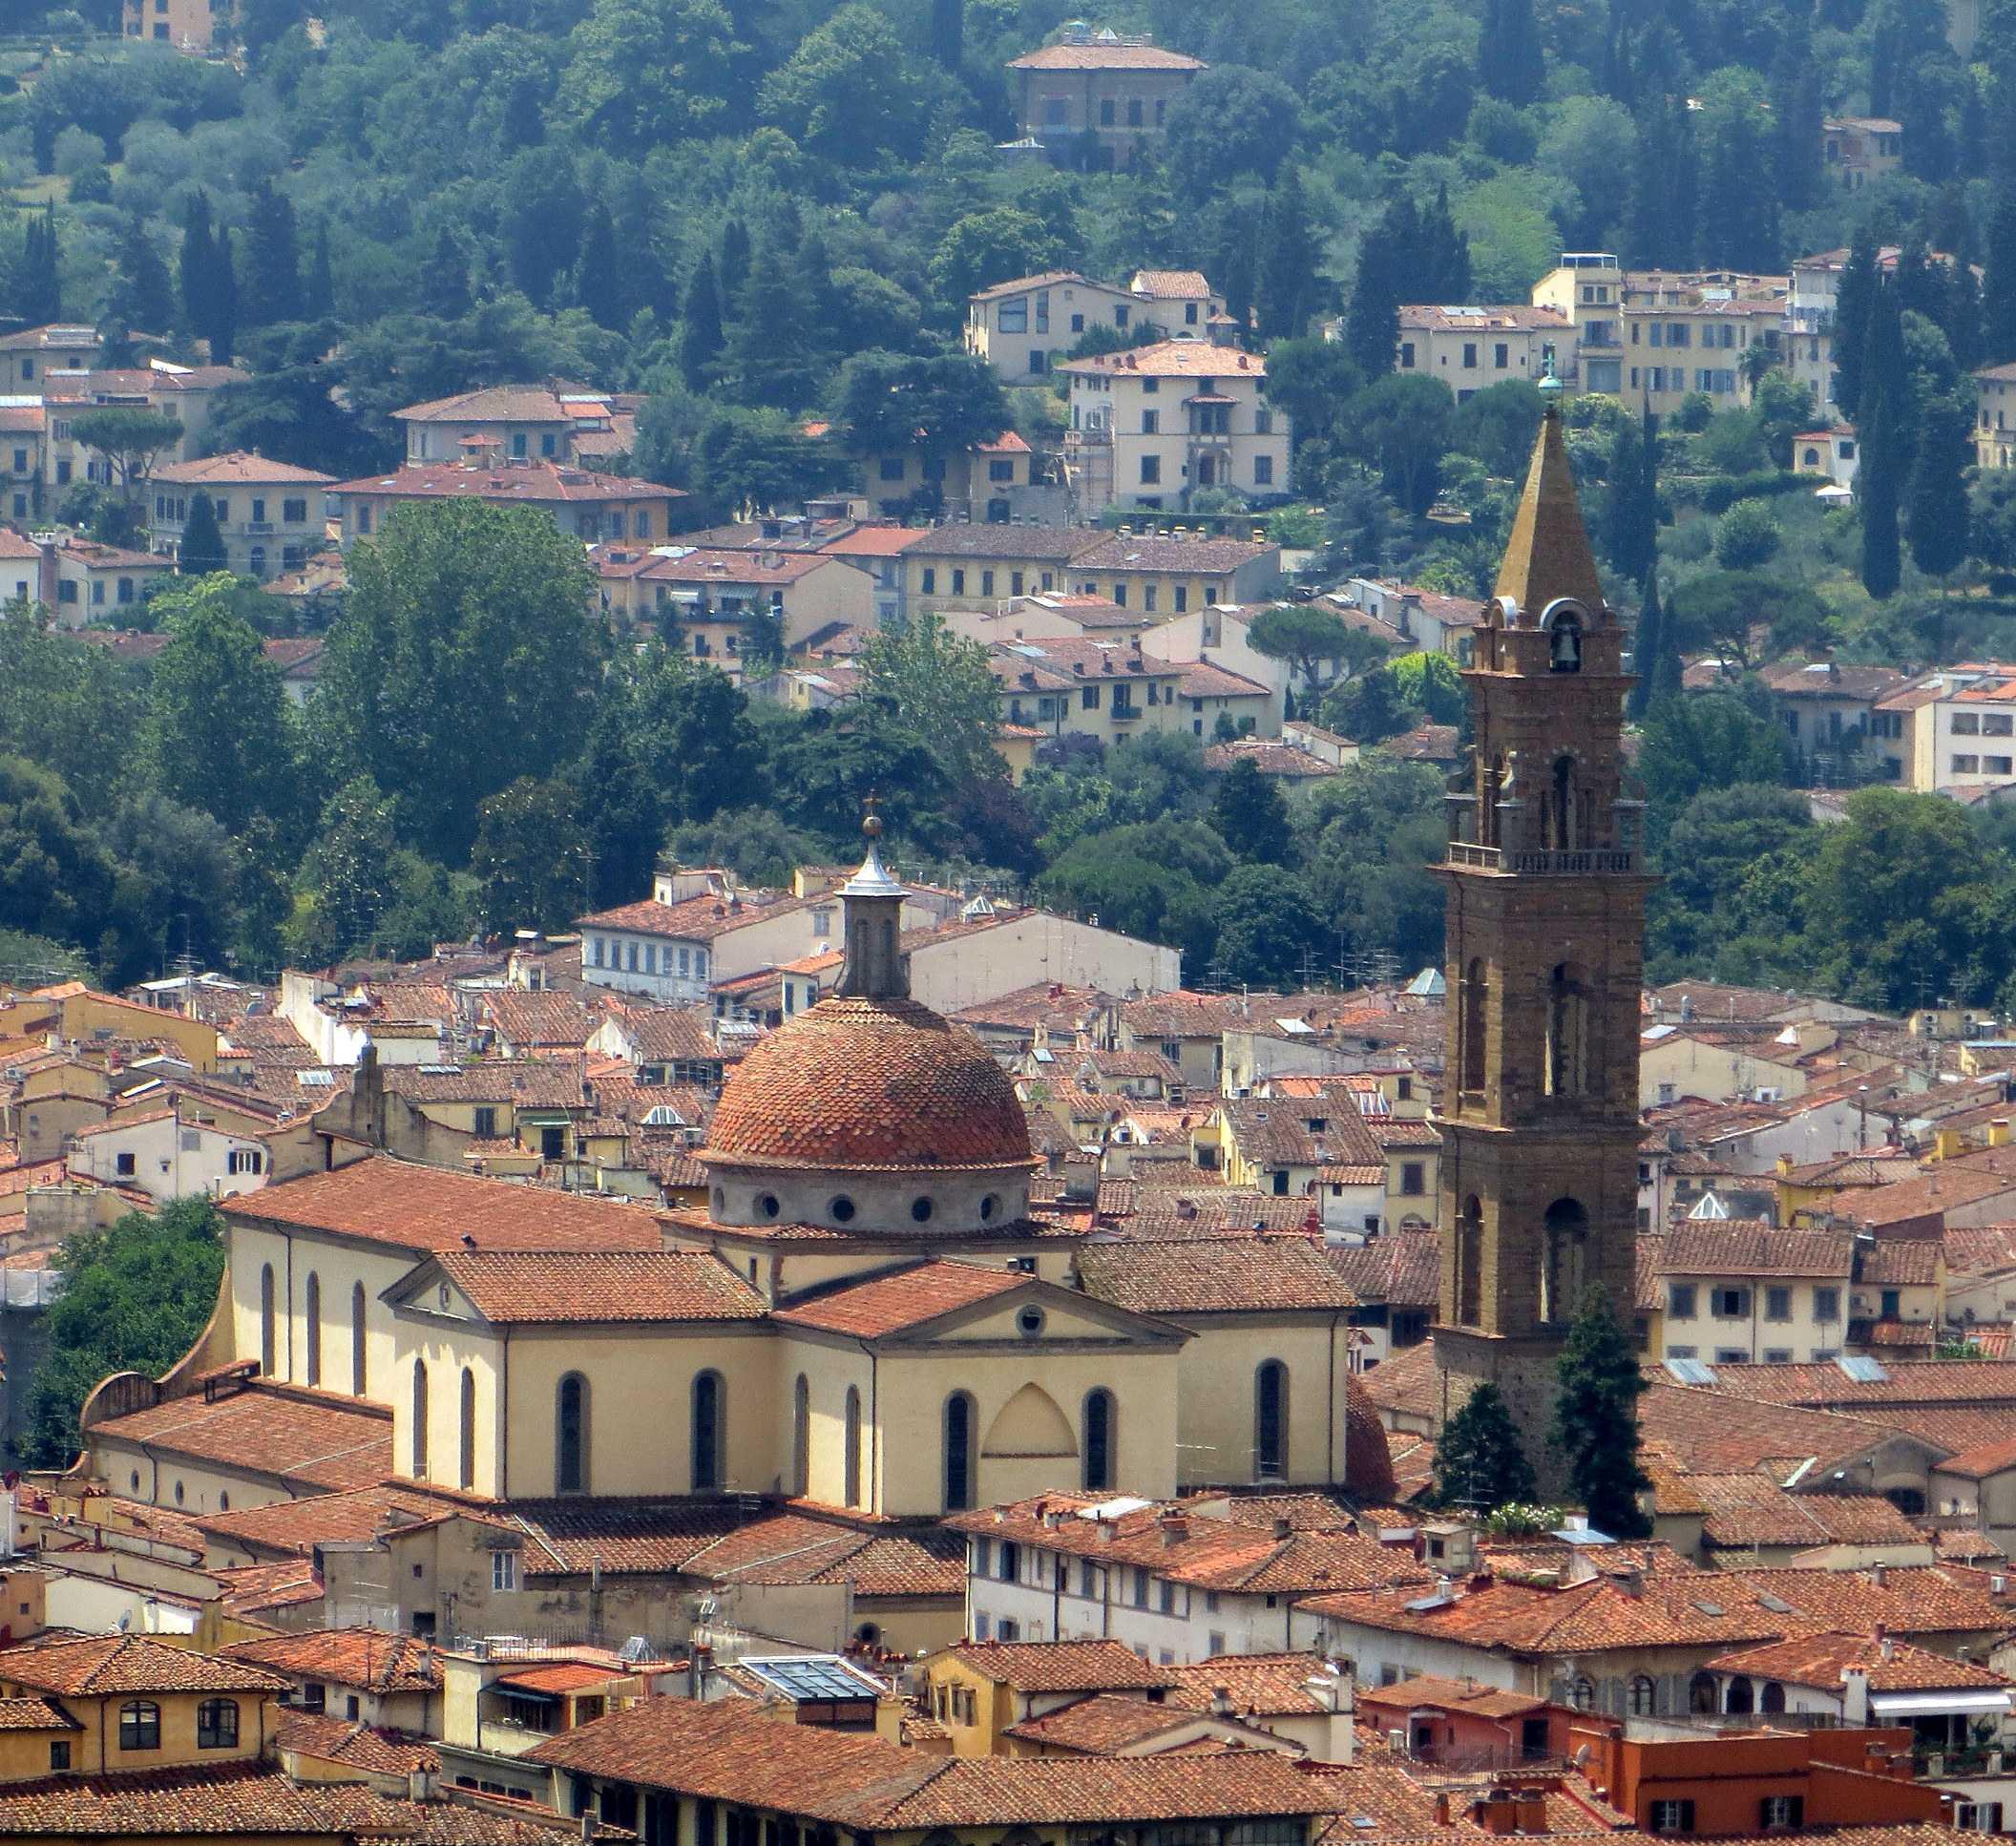 The Renaissance-style basilicas selected by Villa Campestri Resort